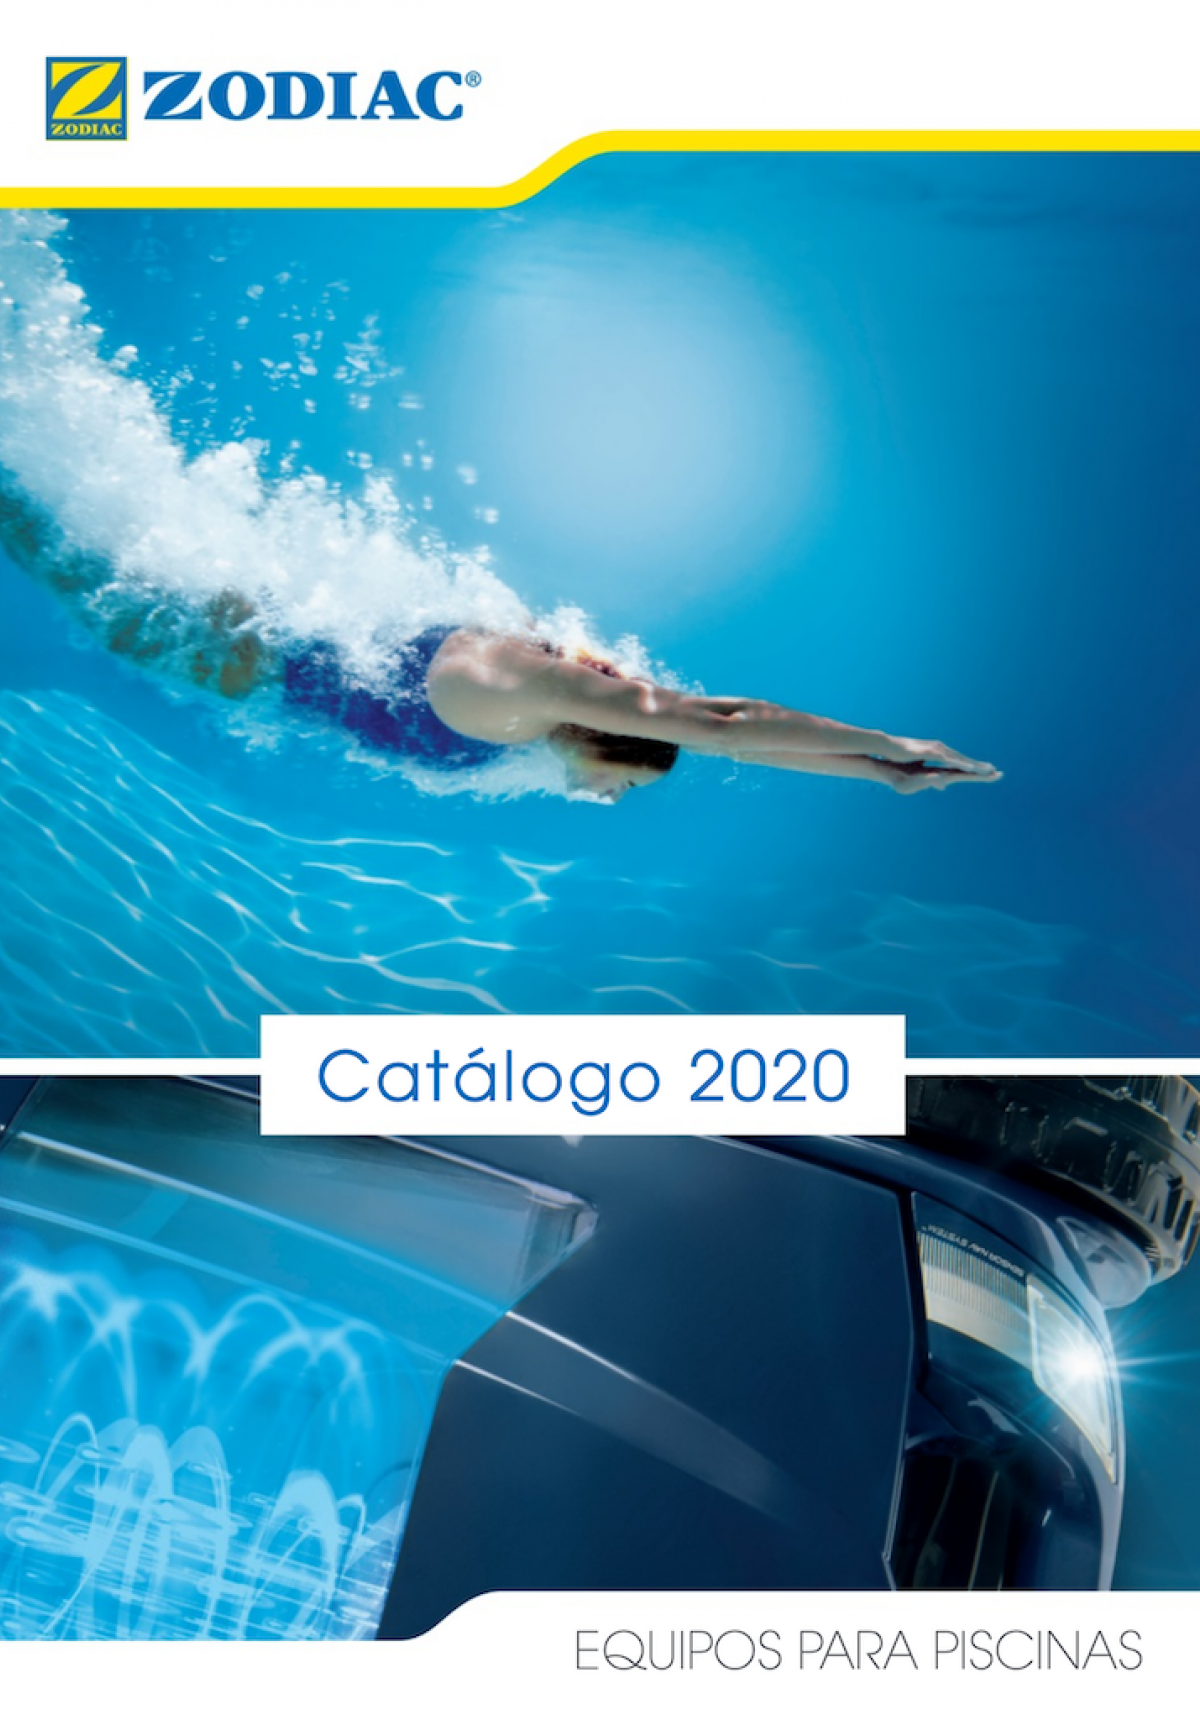 catalogo zodiac 2020